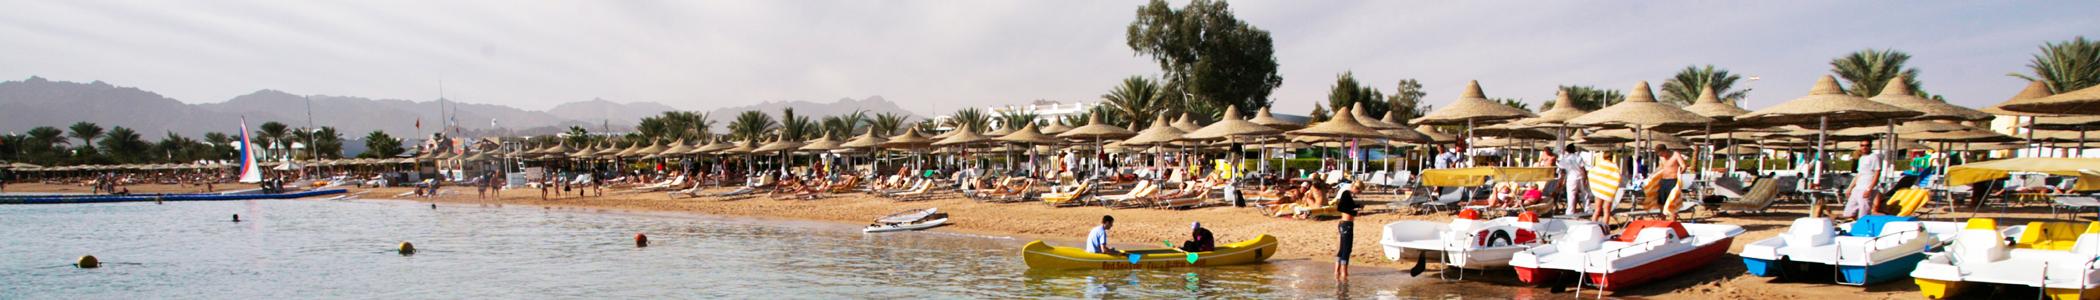 travel sharm sheikhegyptgettingaround